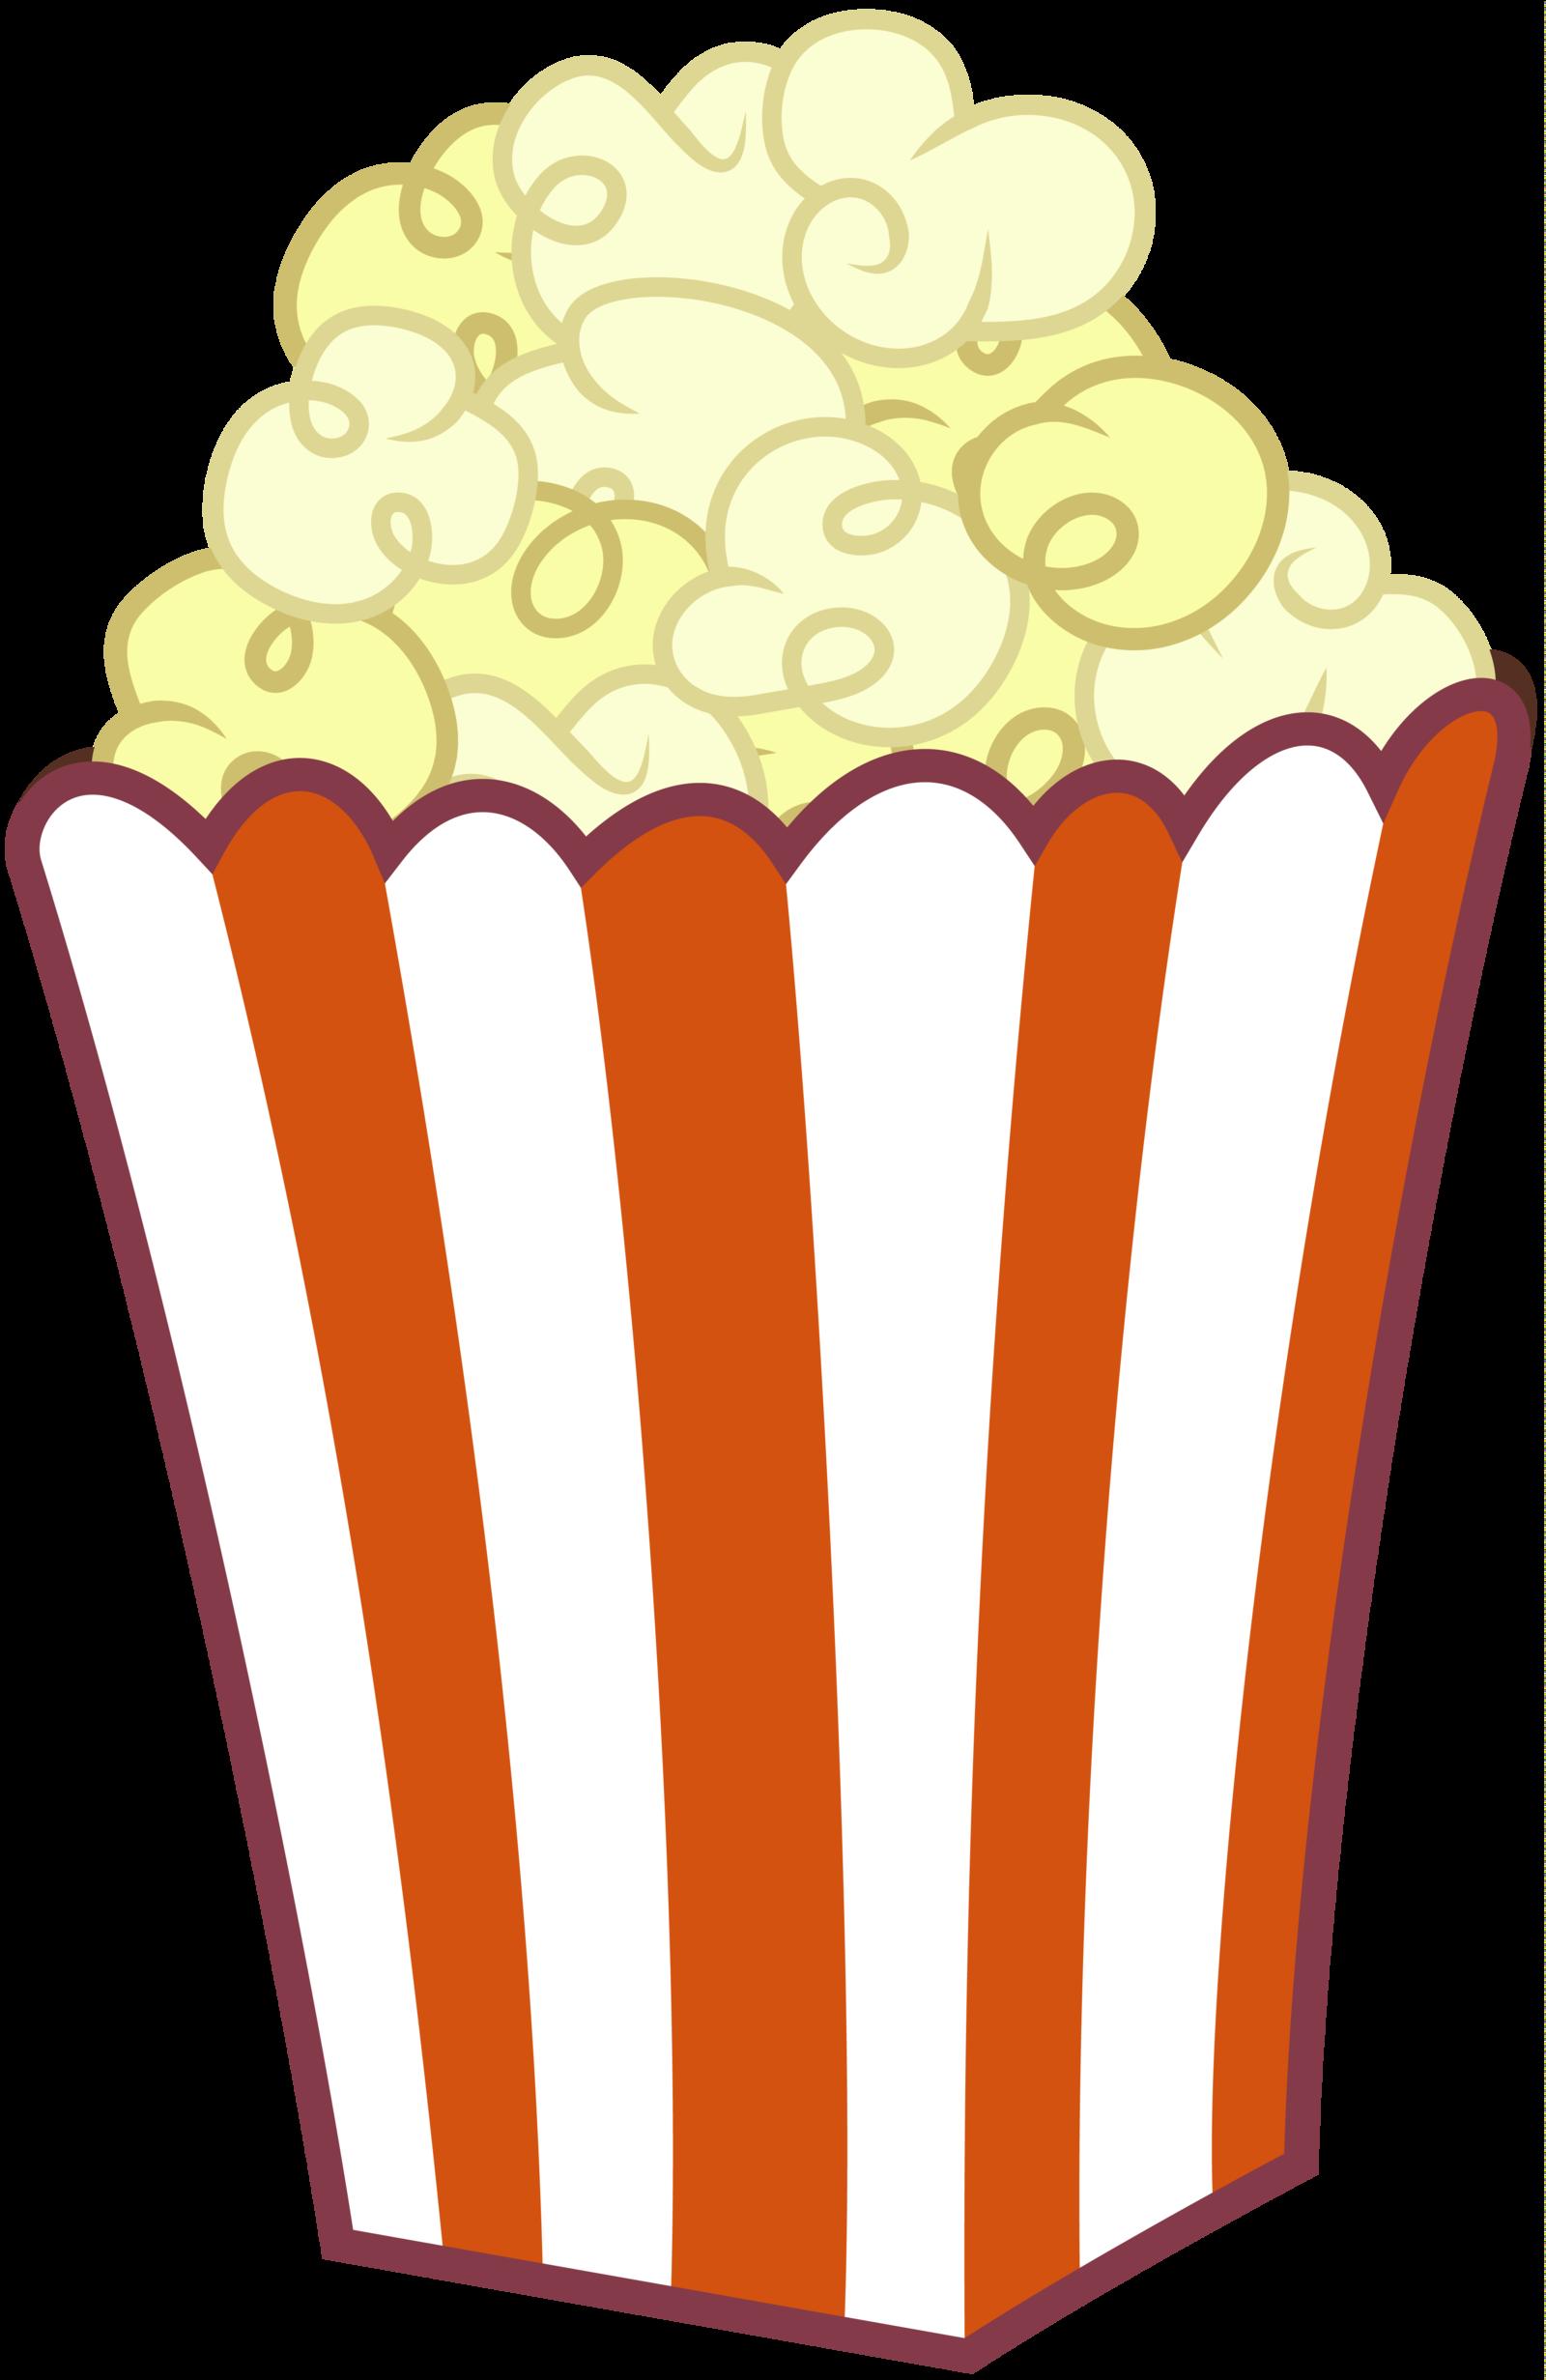 Bowl of popcorn clipart vector transparent library Free Cliparts Popcorn Bowl, Download Free Clip Art, Free Clip Art on ... vector transparent library